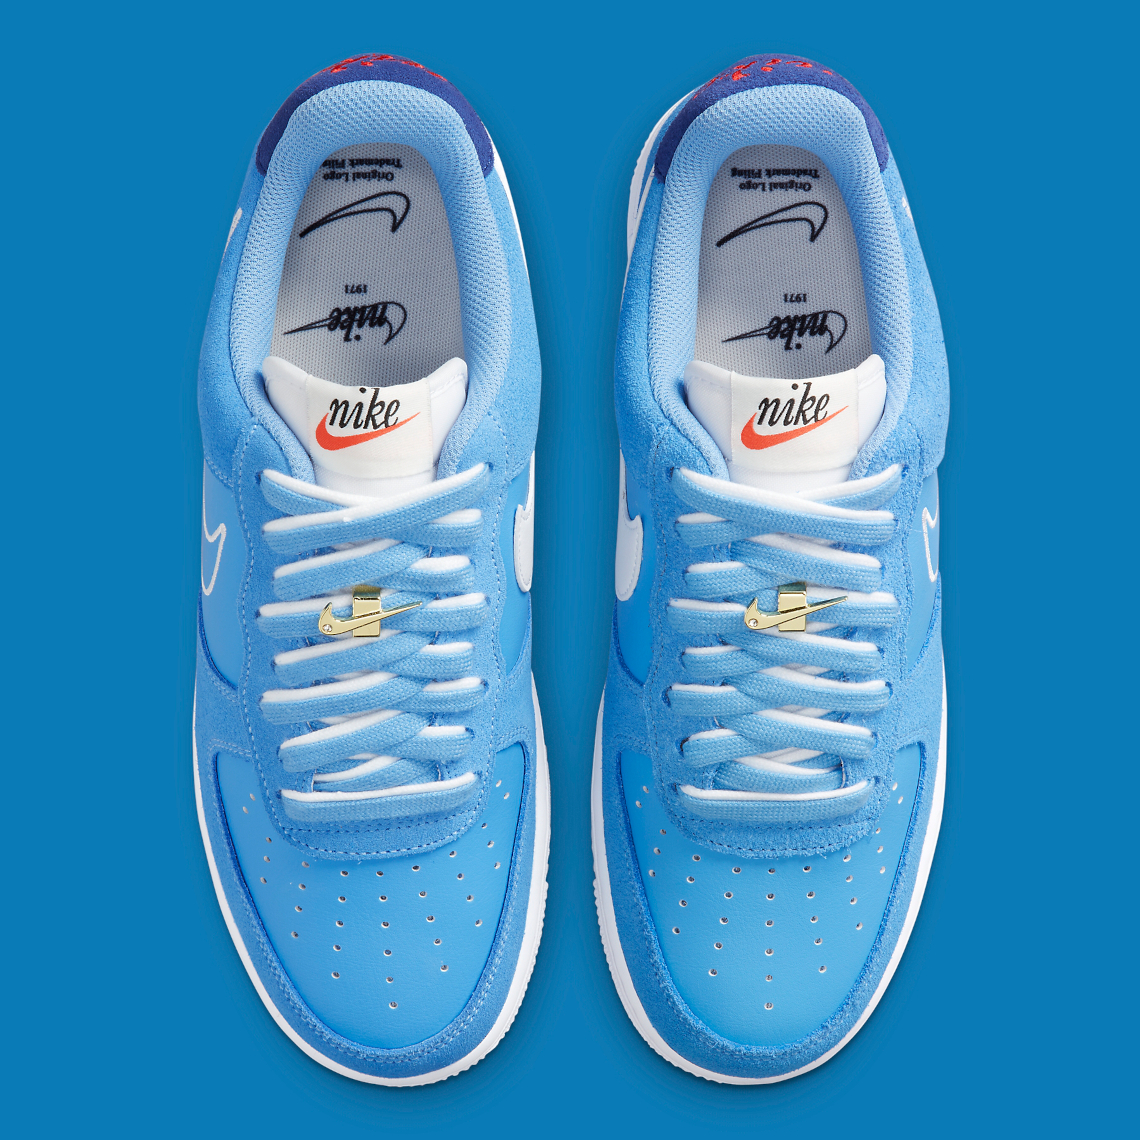 Nike Air Force 1 Low University Blue DB3597-400   SneakerNews.com